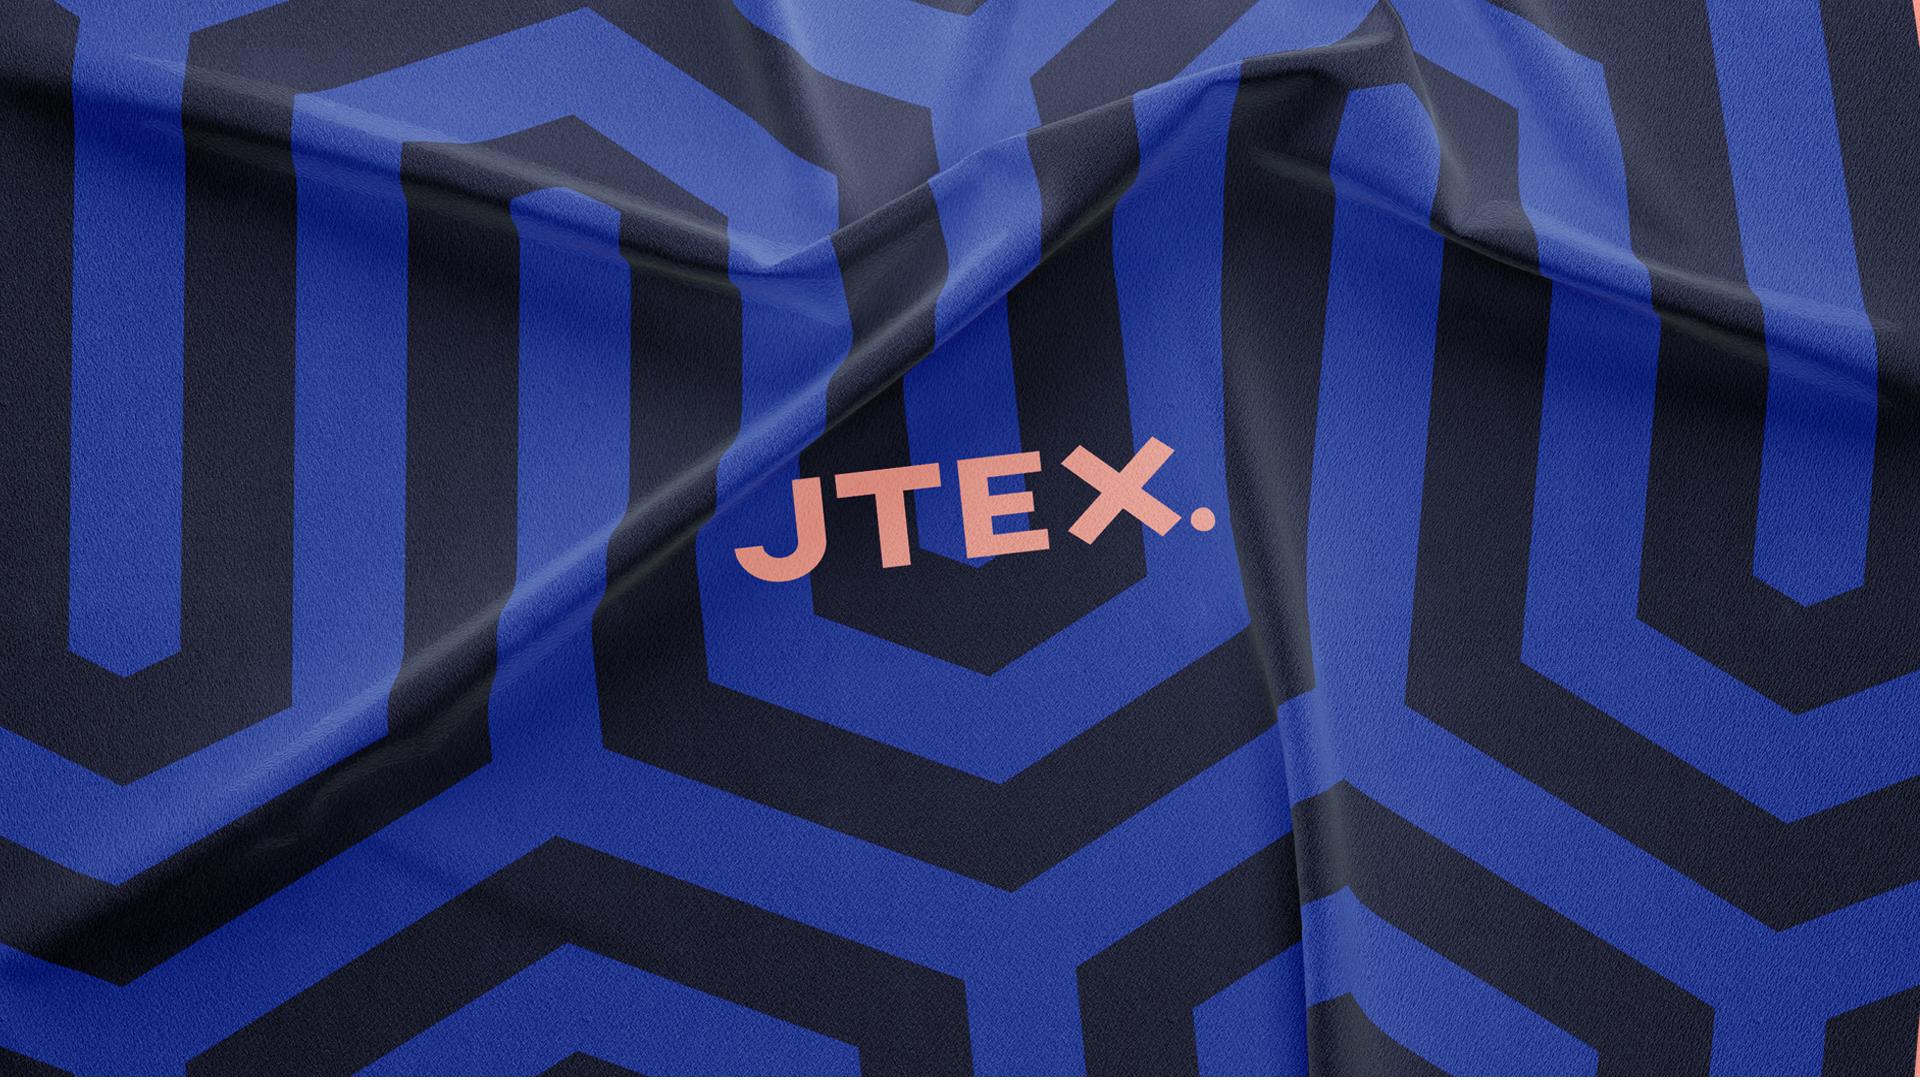 The Buri Brand - JTEX1.png